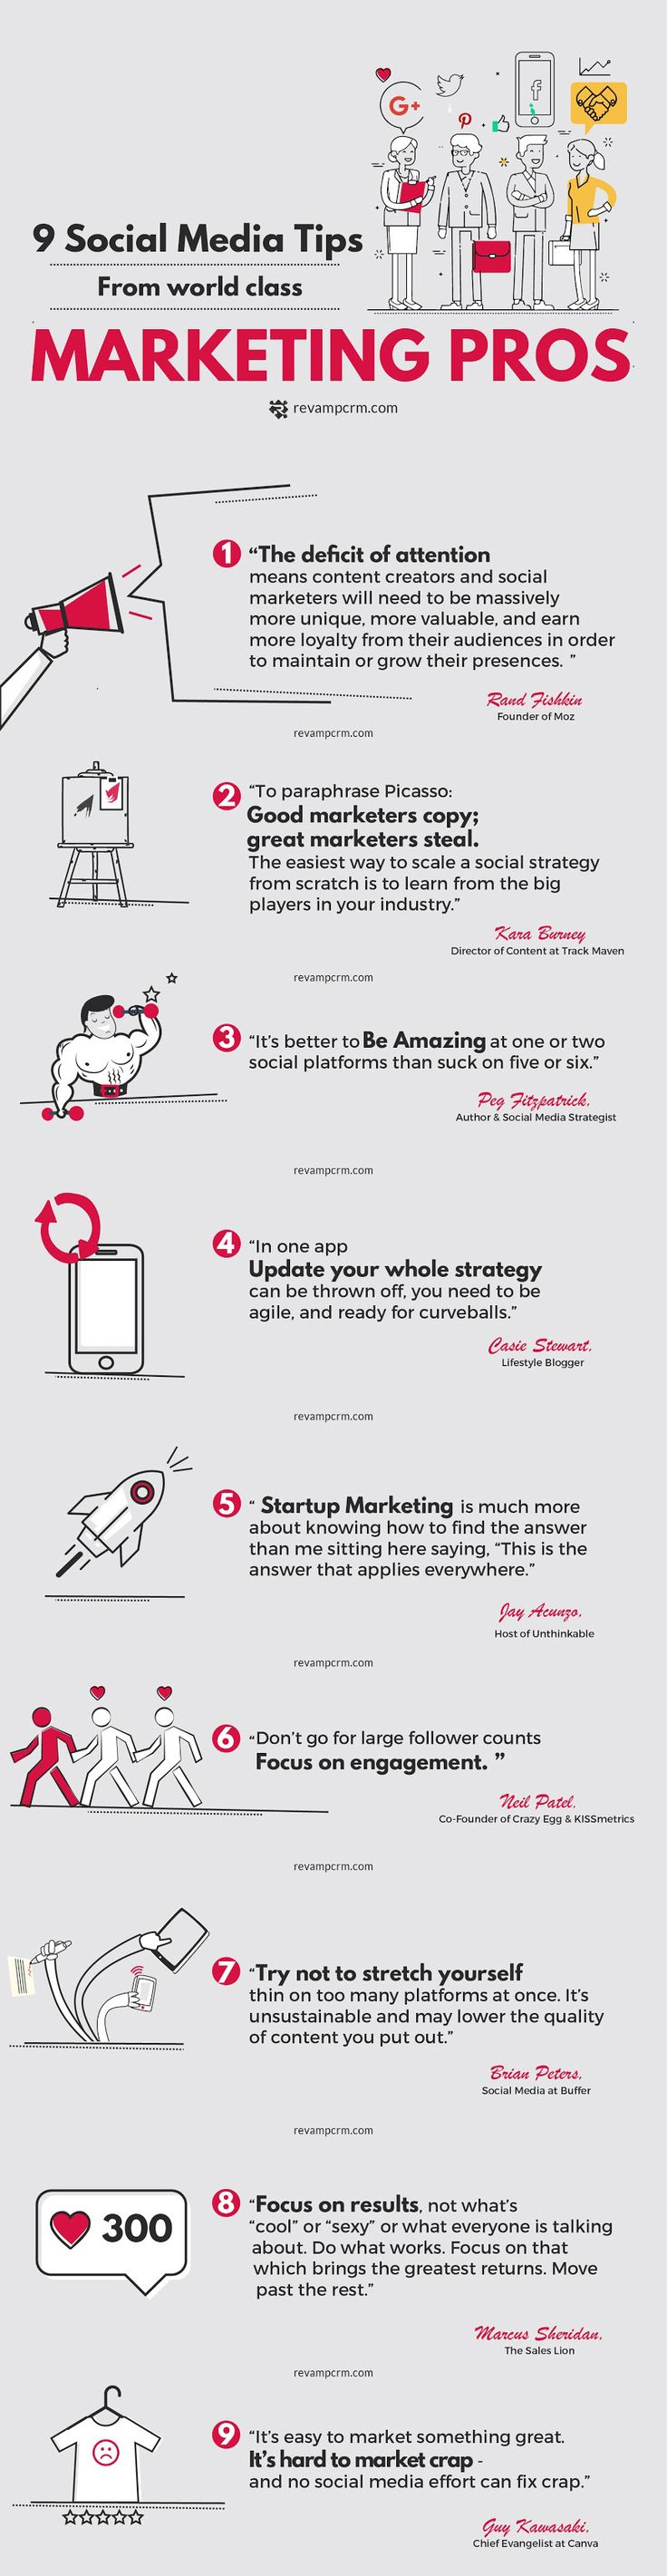 Social Media Marketing Tips Infographic